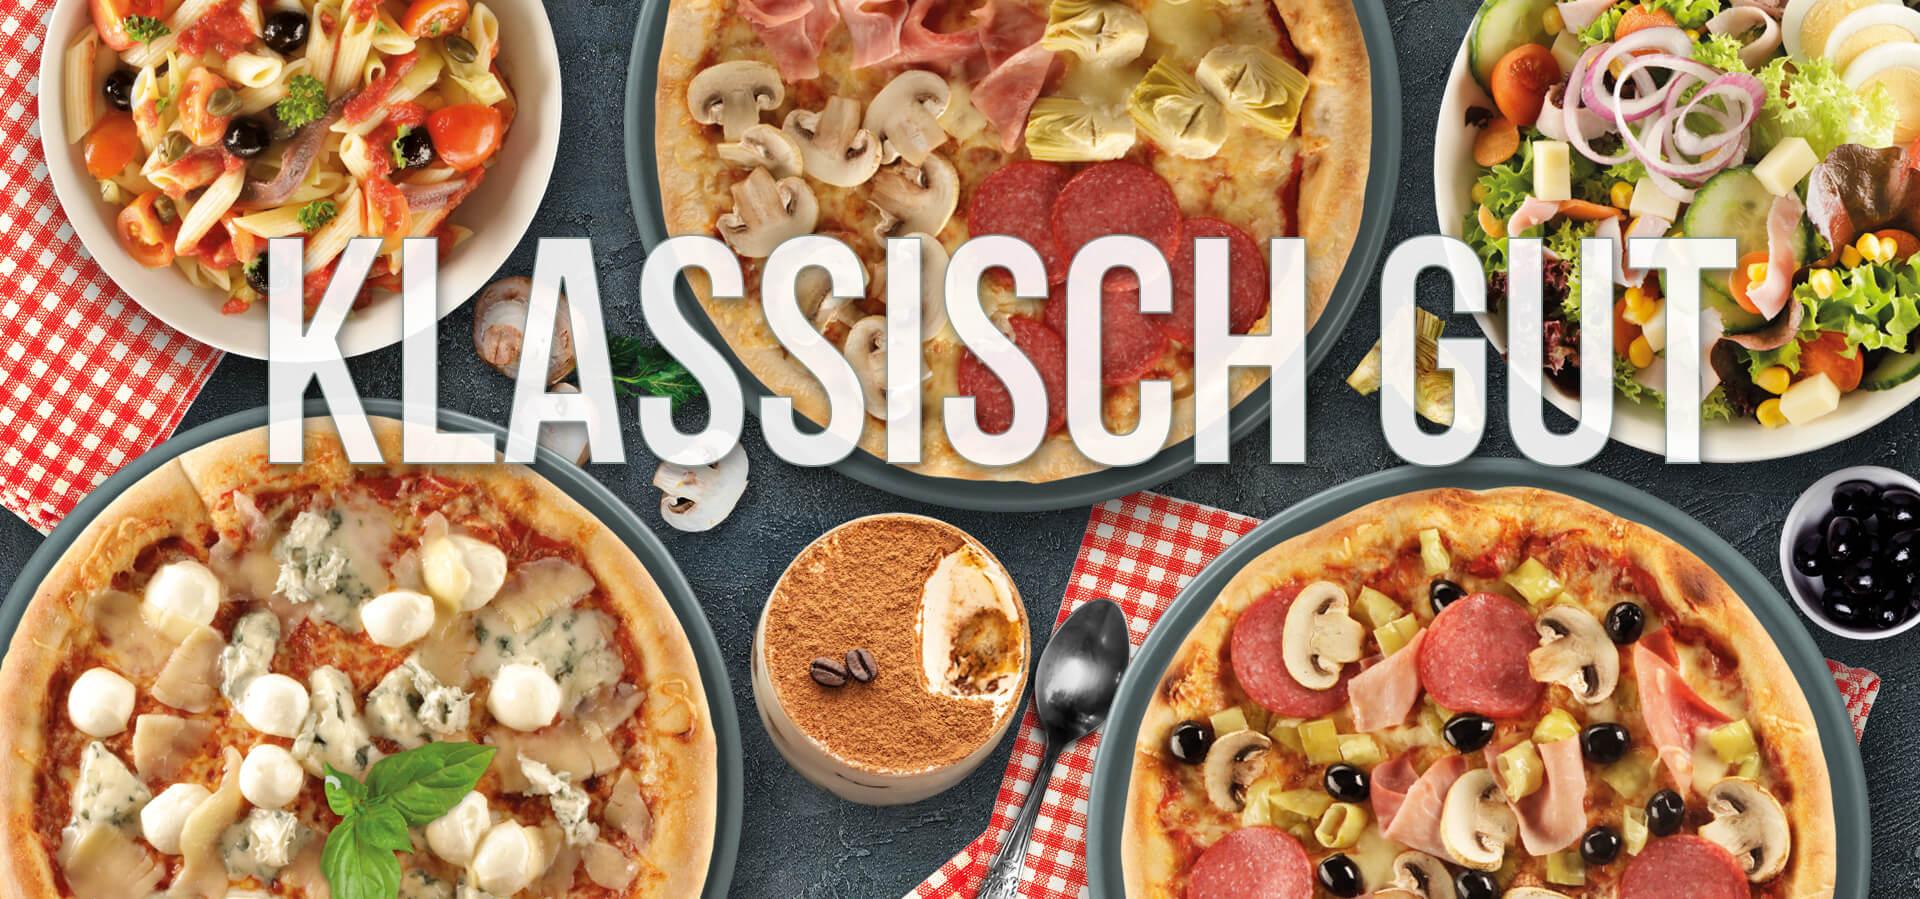 Pizza Pasta_Speisekarte_Jan-Maerz